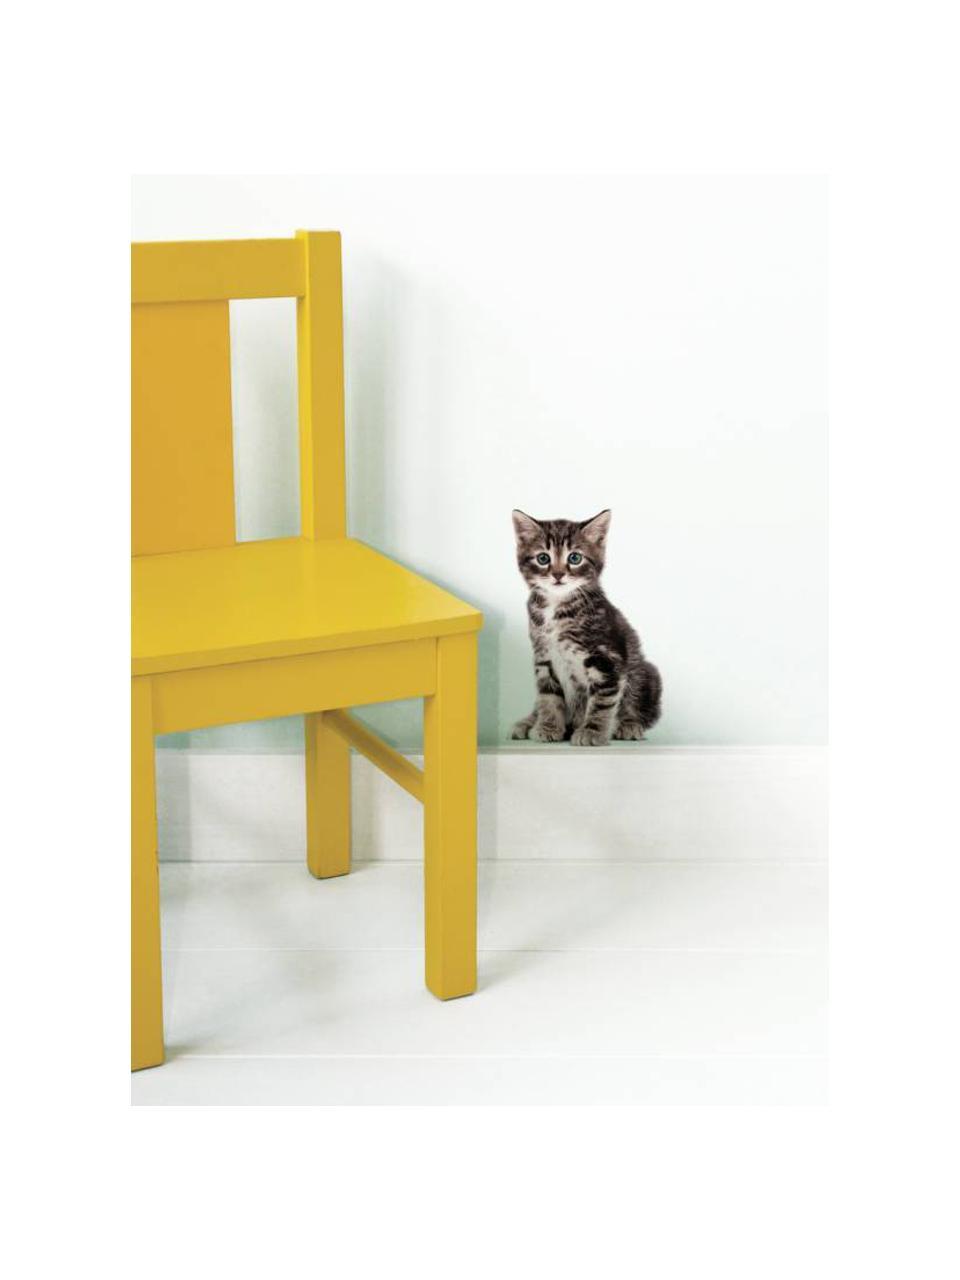 Wandaufkleber Zoe, Selbstklebende Vinylfolie, matt, Braun, Schwarz, Beige, 13 x 20 cm